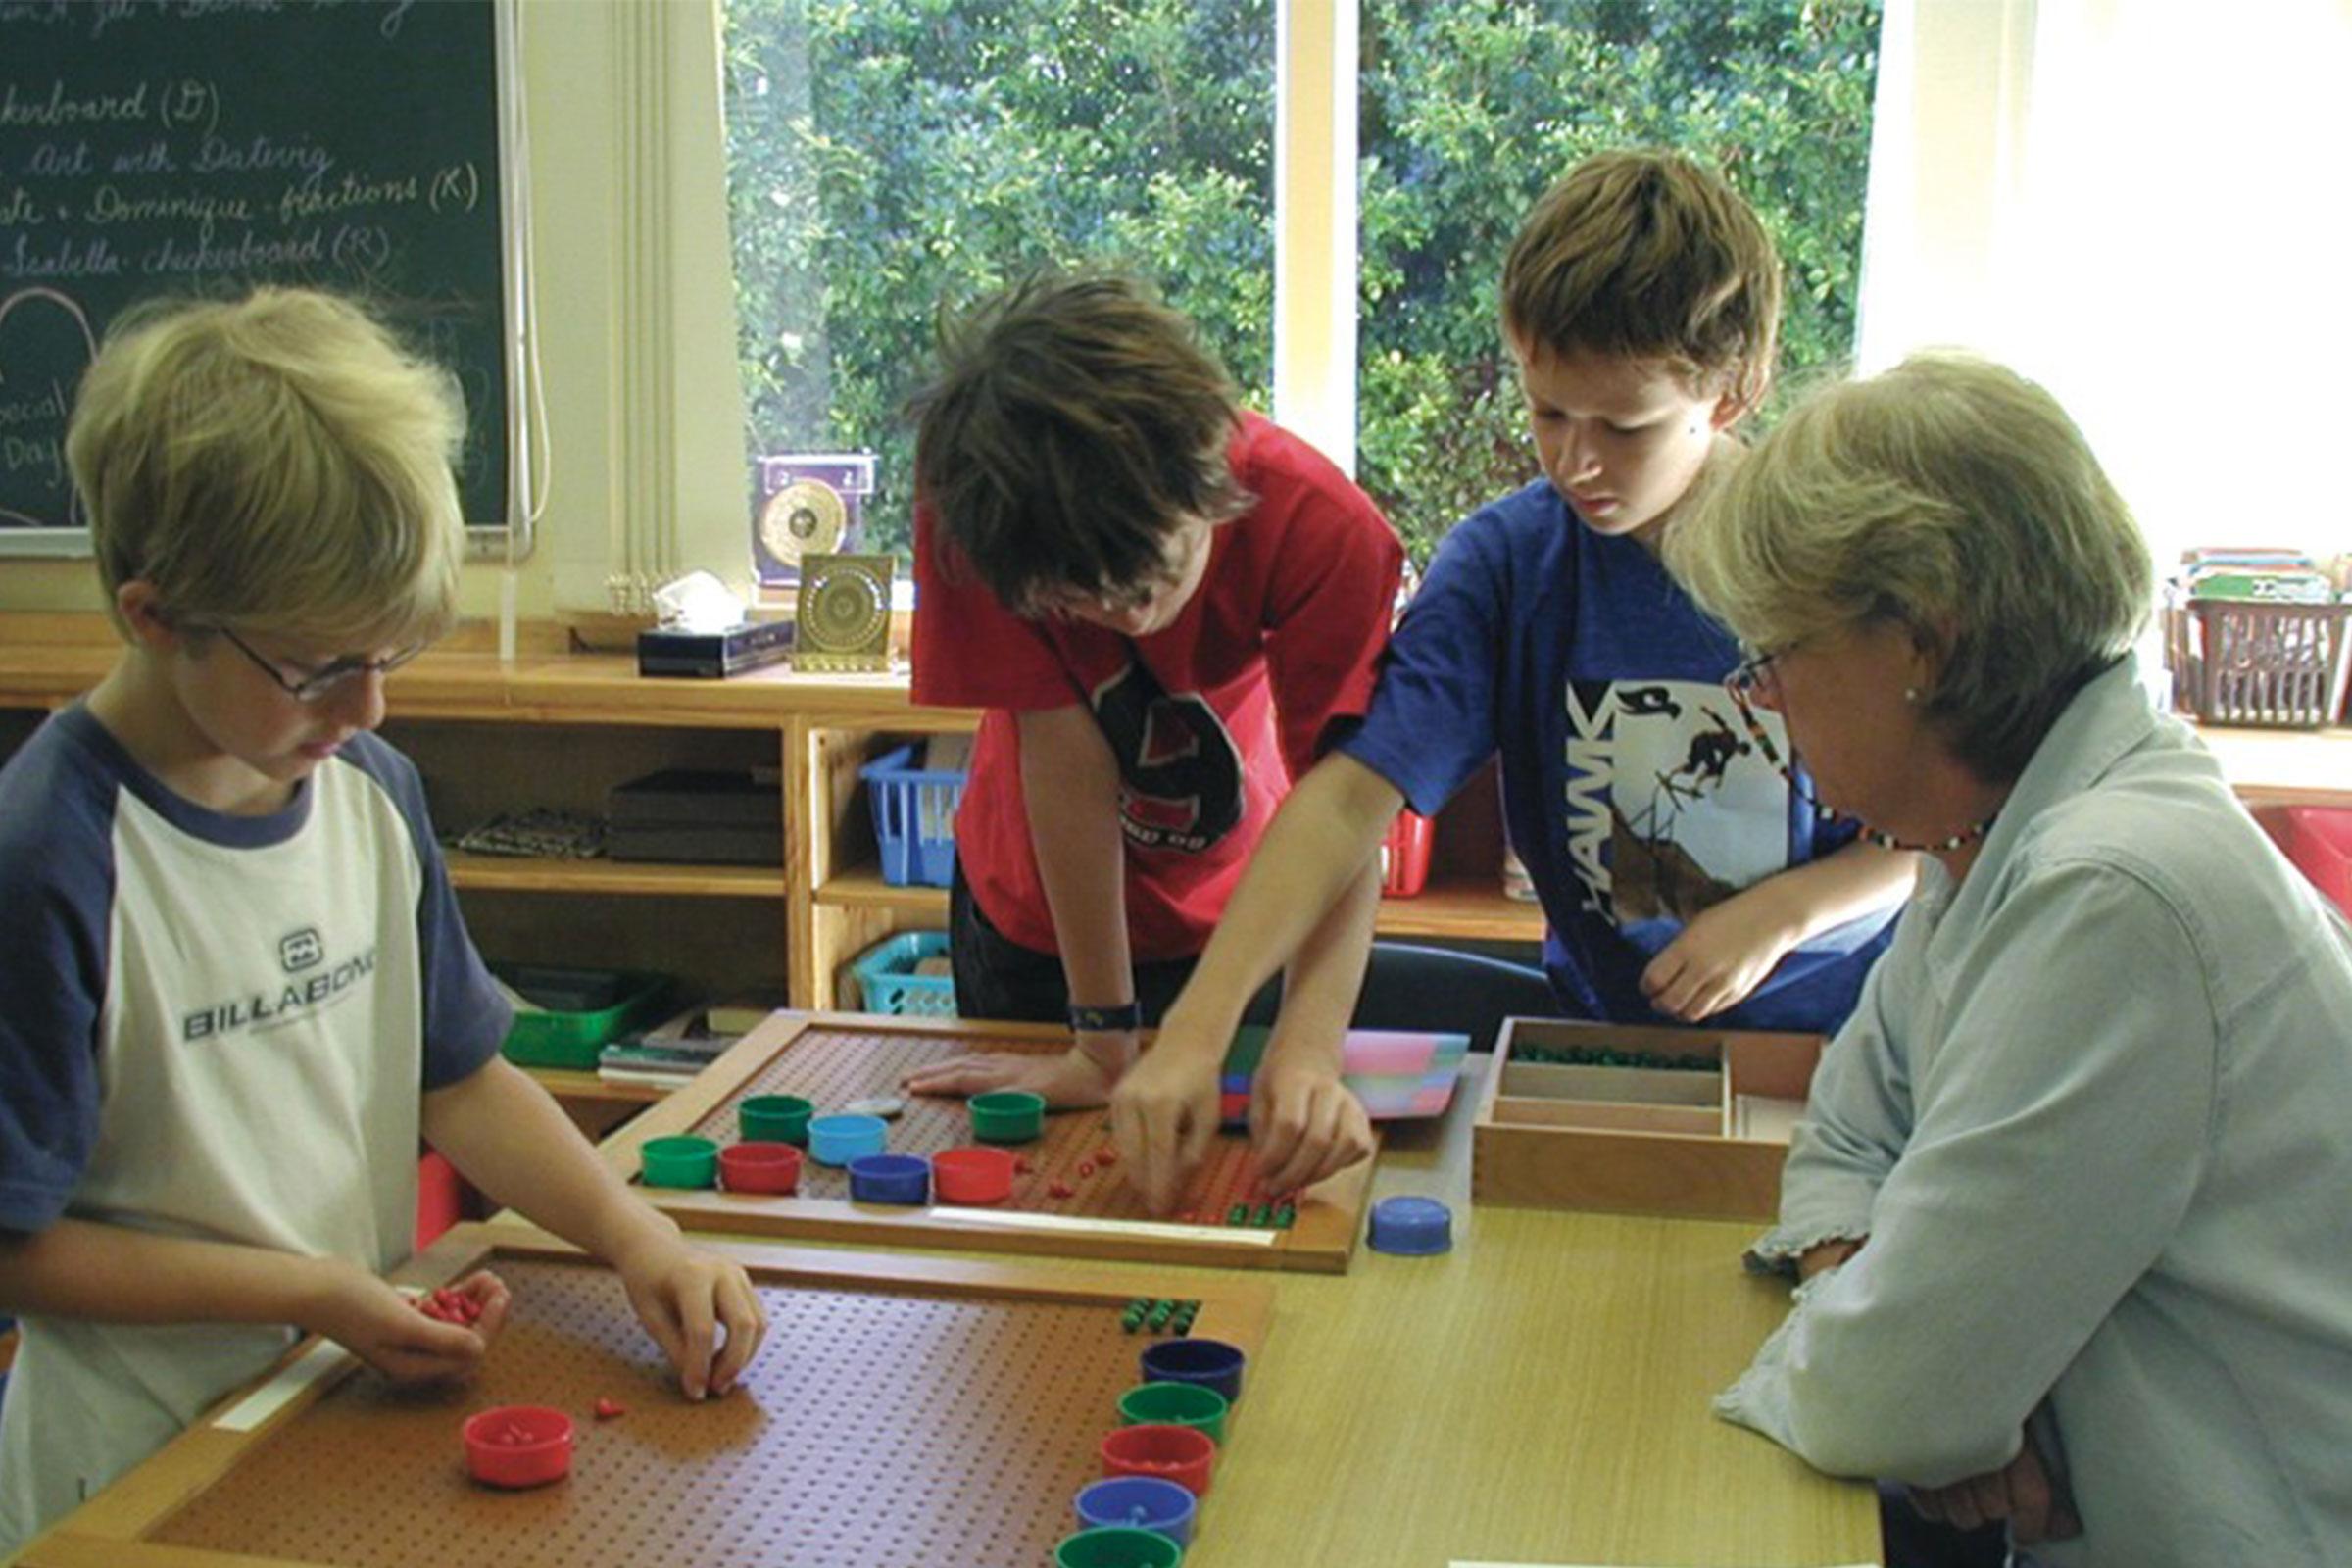 Montessori teacher observing group of primary children